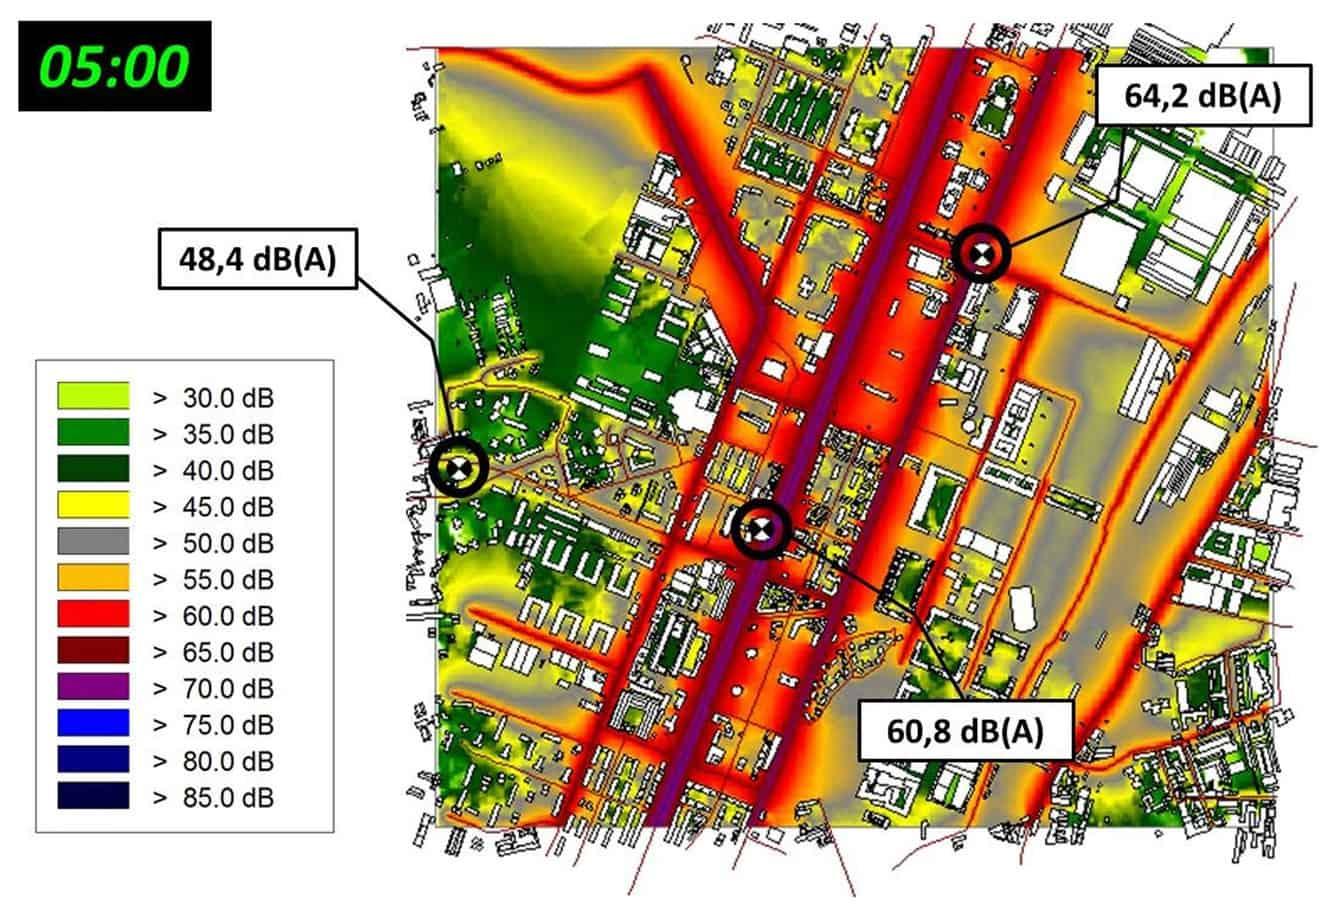 La mappa globale tipo generata dal Sistema Dynamap